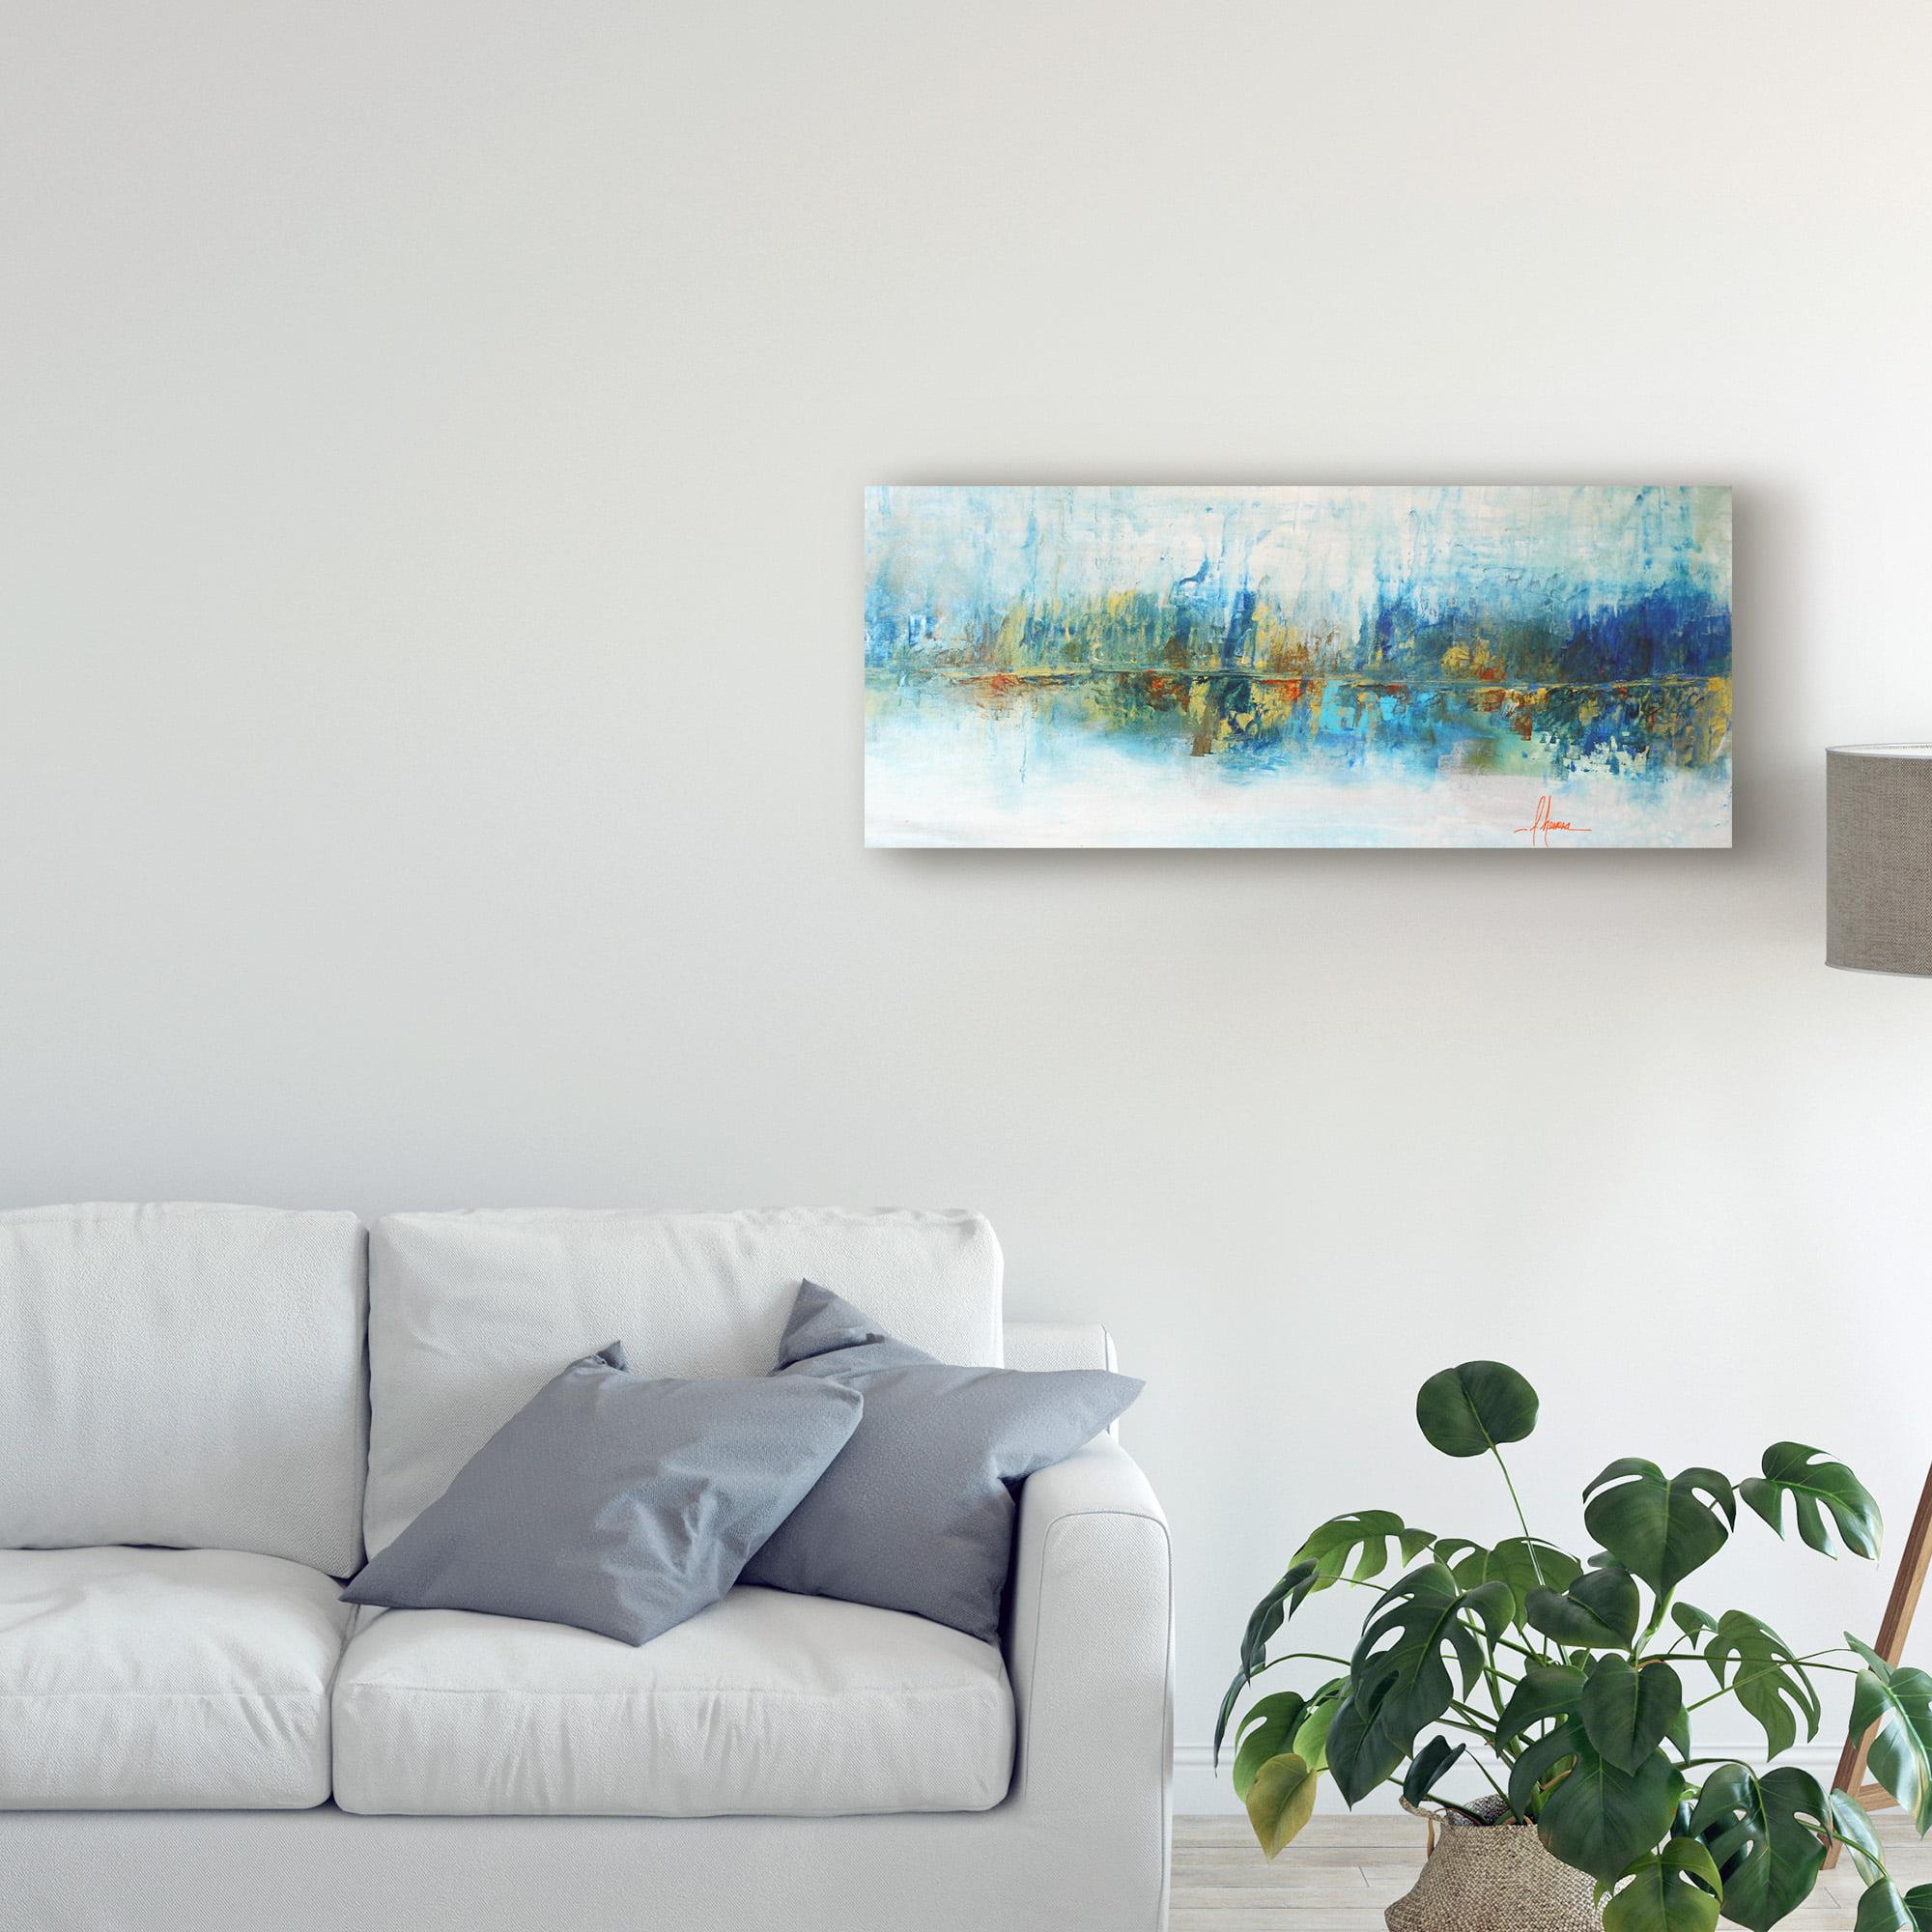 Giclee Canvas Wall Art /'Aqua Azul/' by Leticia Herrera